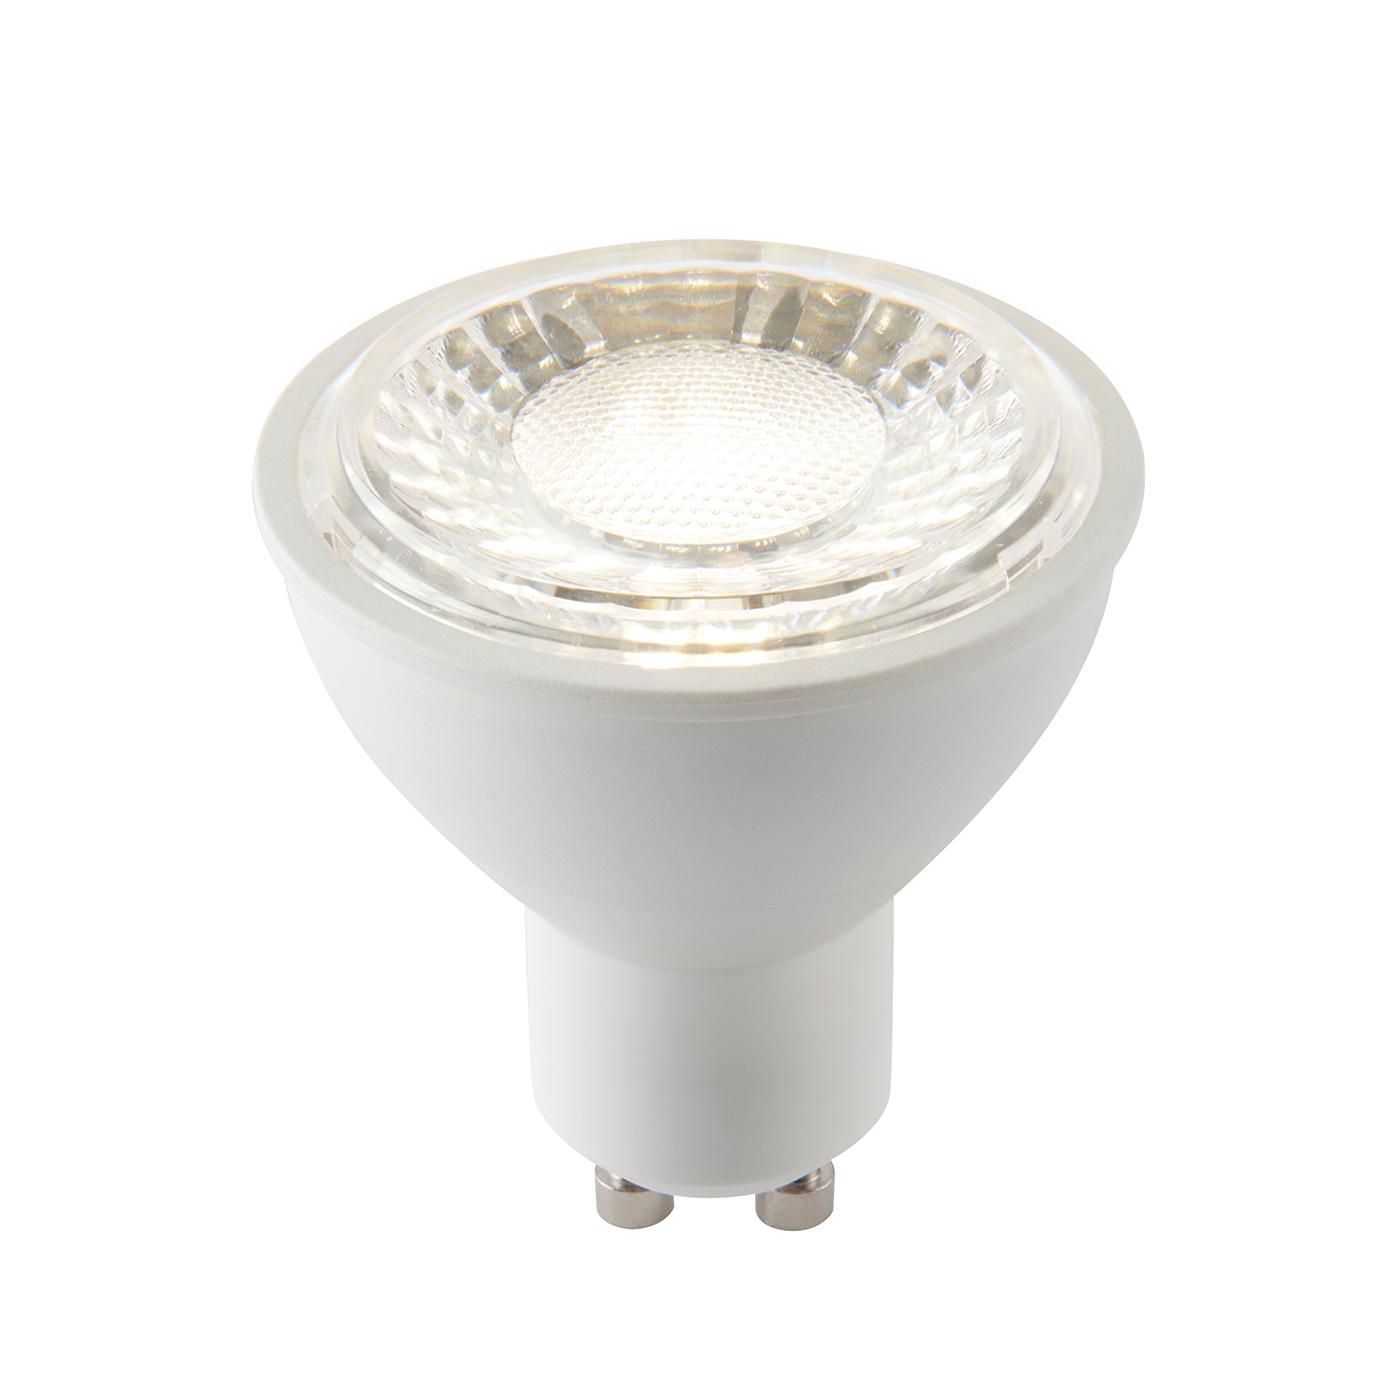 Endon 70046 LED SMD Lamp 4000K GU10 4W